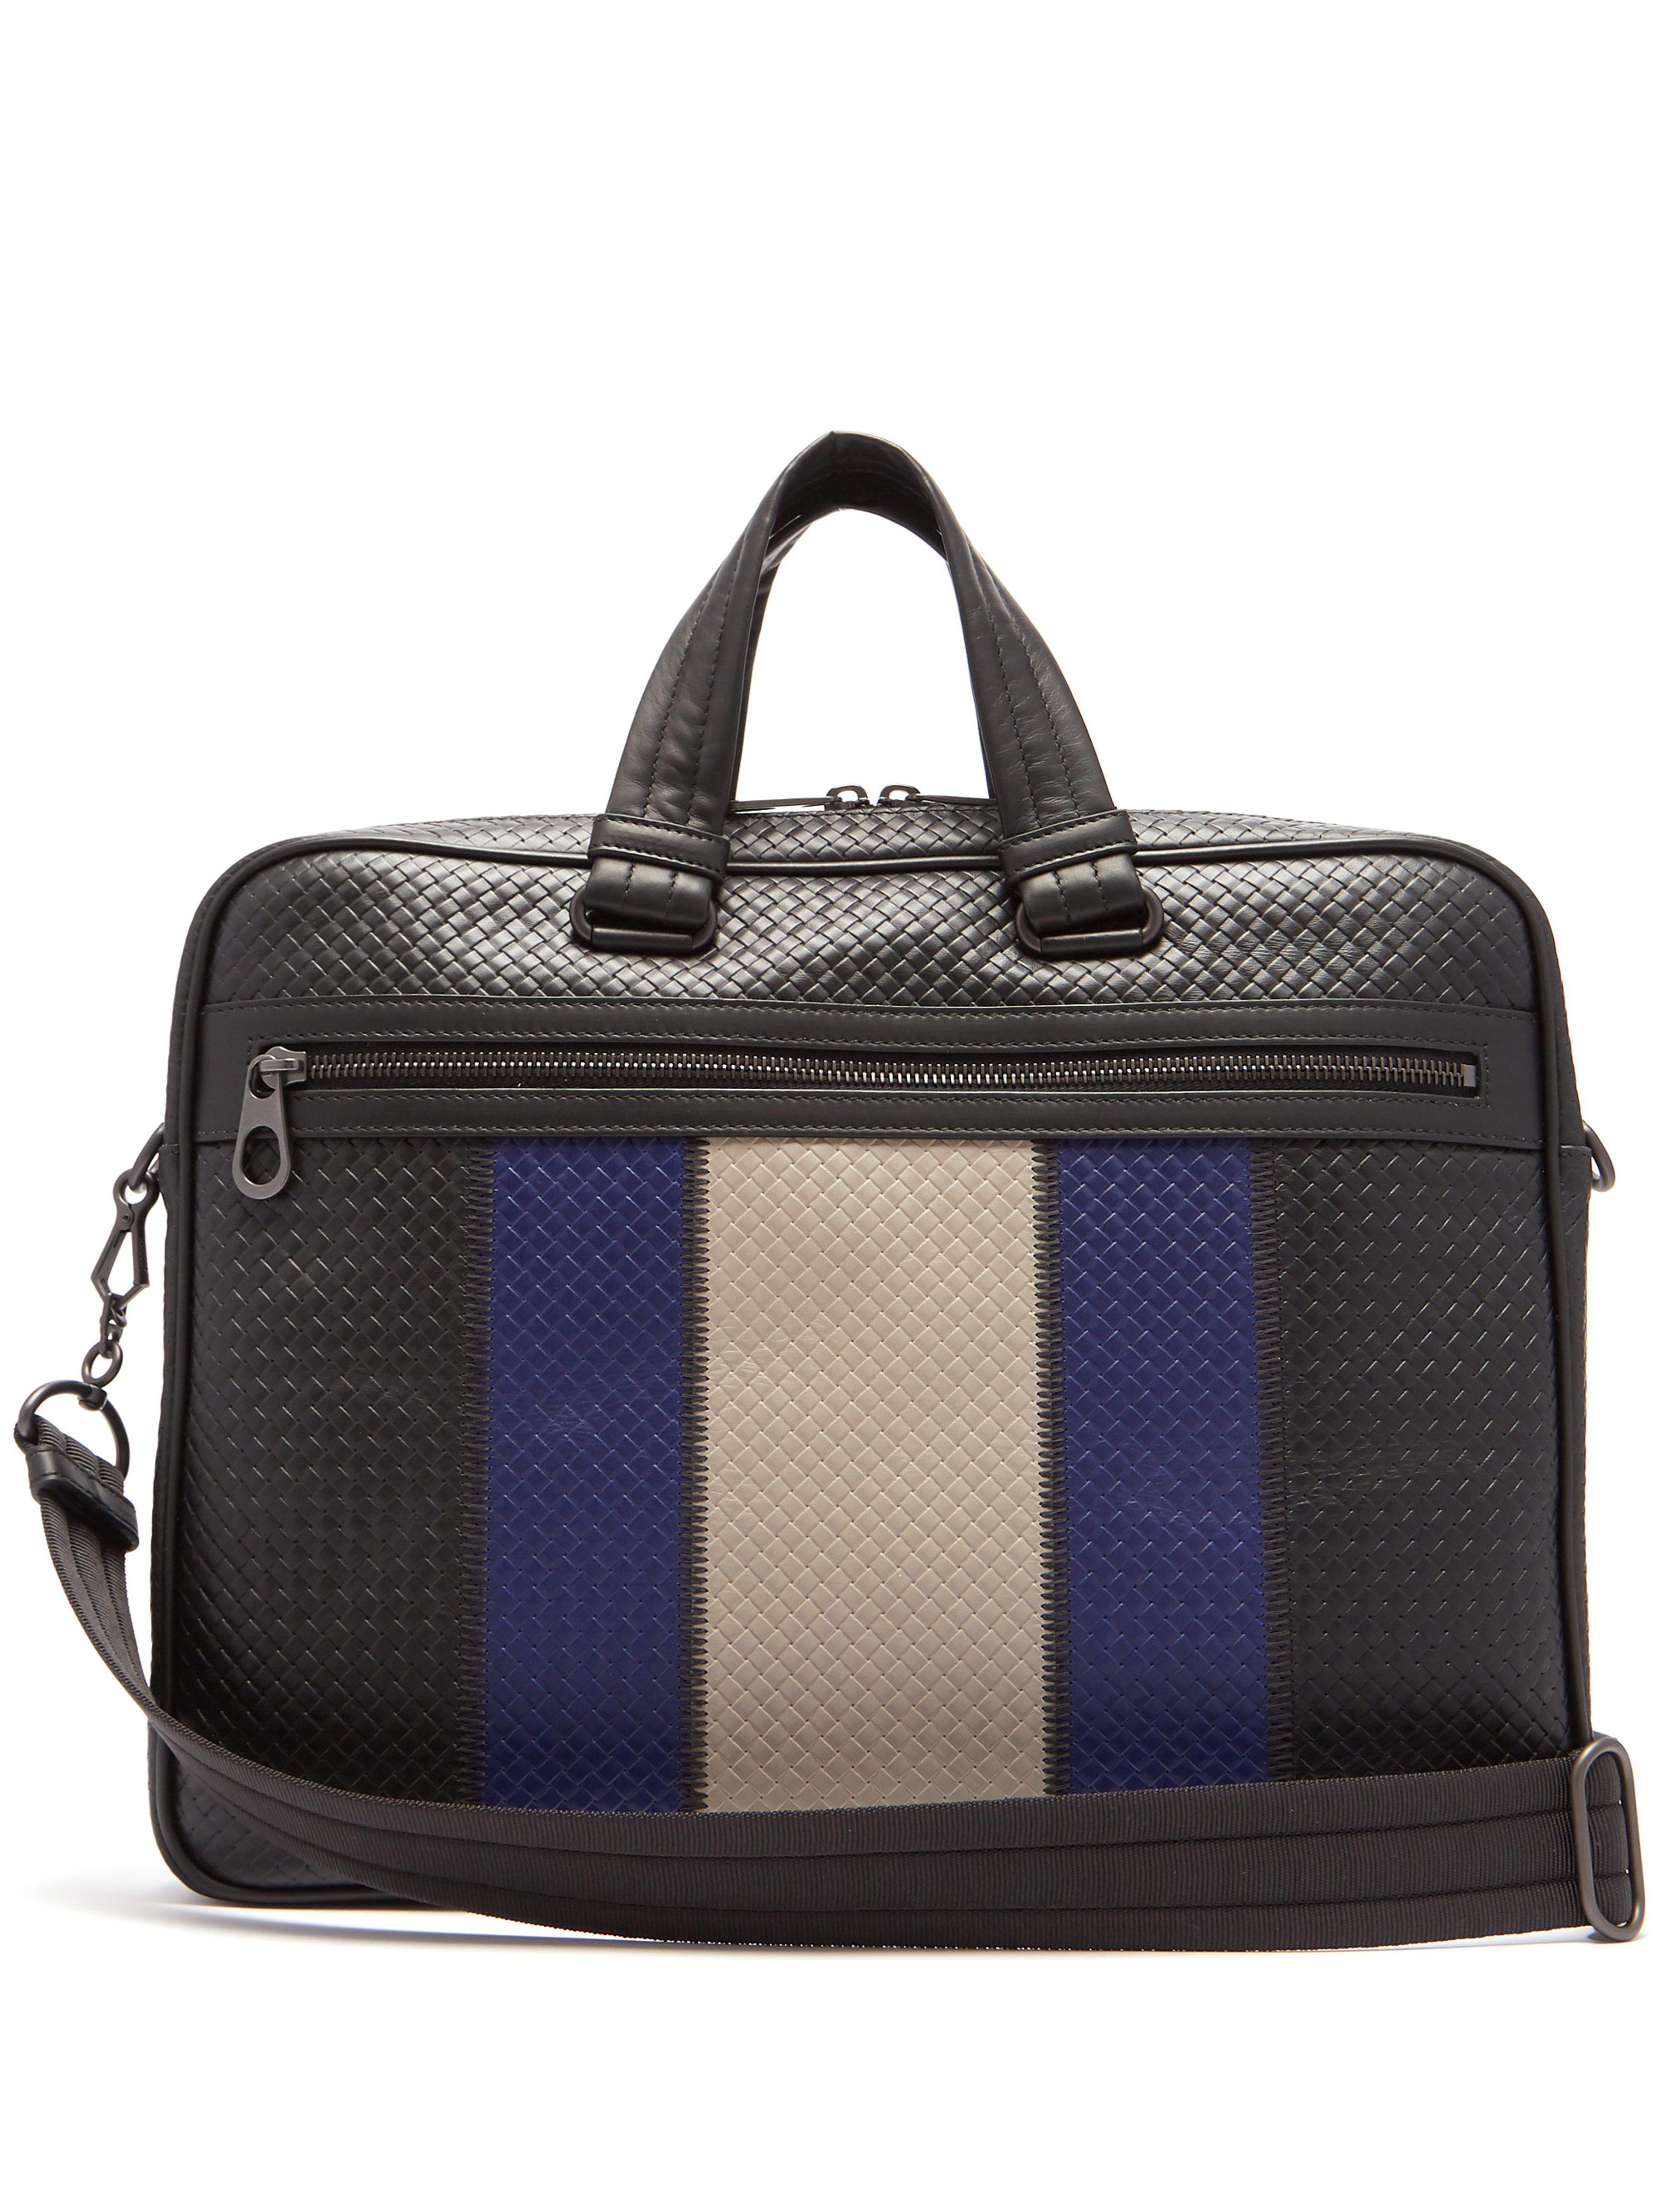 47f480537bbb Bottega Veneta Striped Intrecciato Leather Briefcase in Black for ...